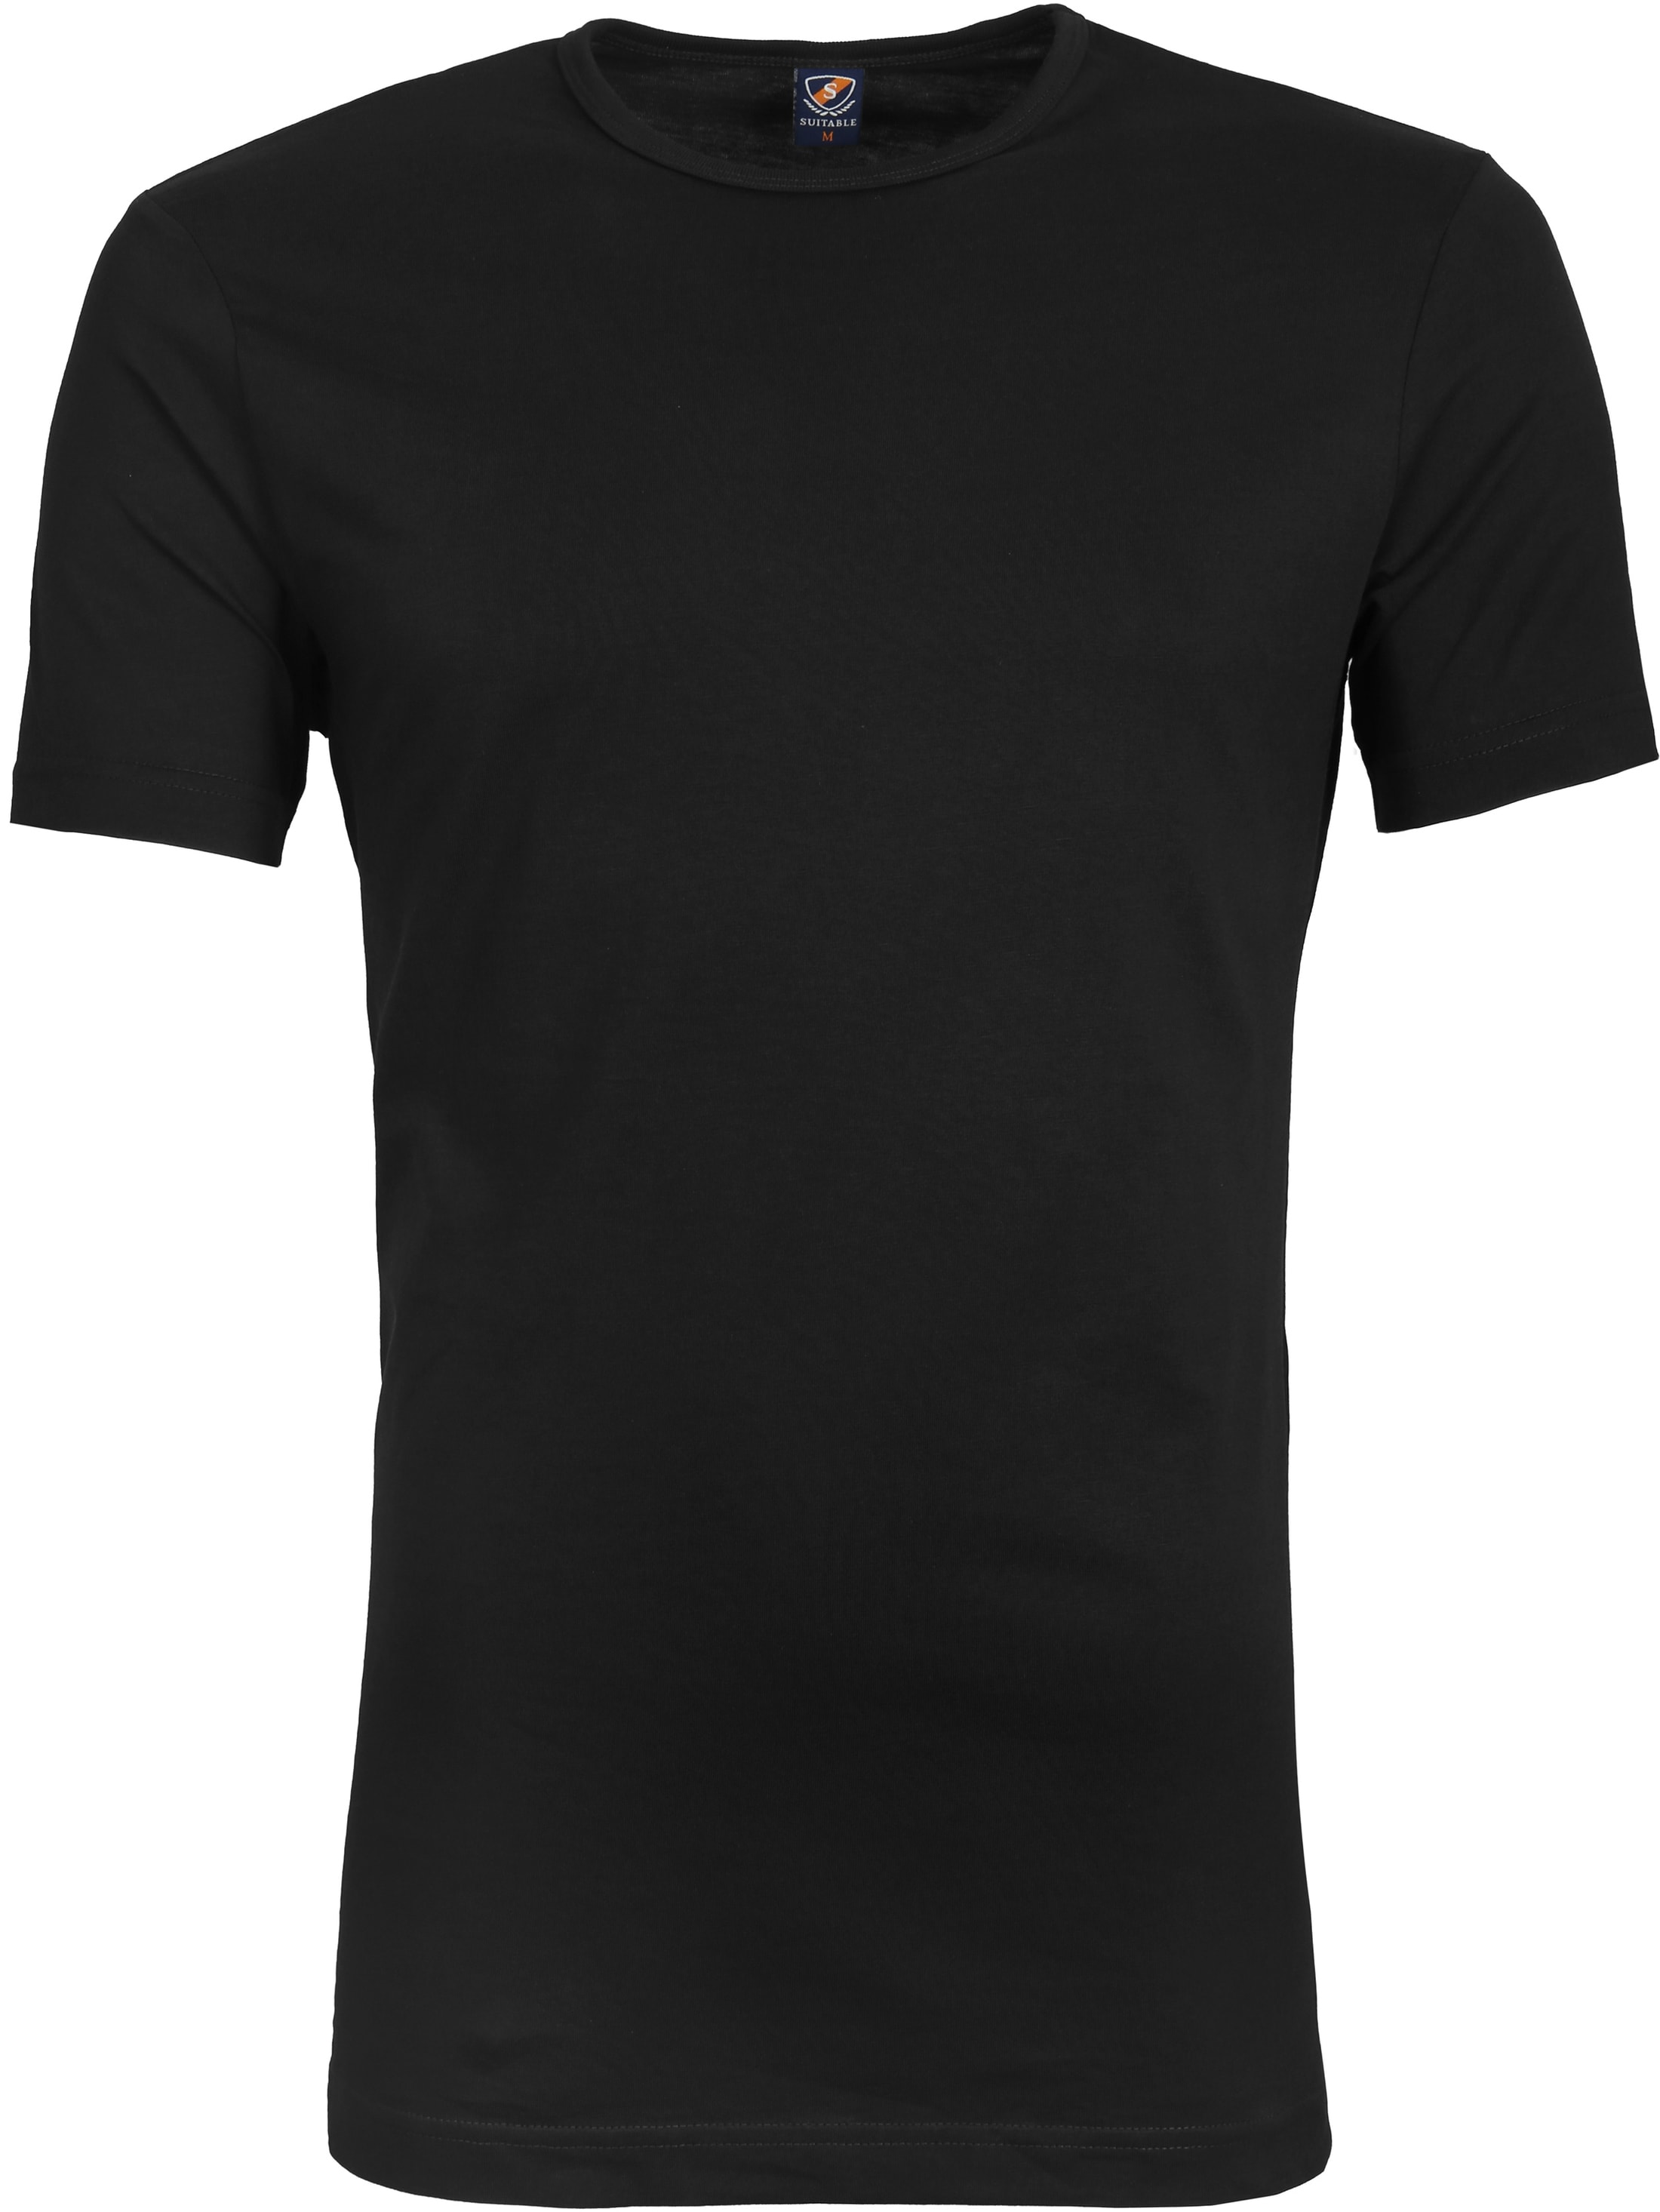 Suitable T-shirt 2-Pack O-Neck Black foto 1